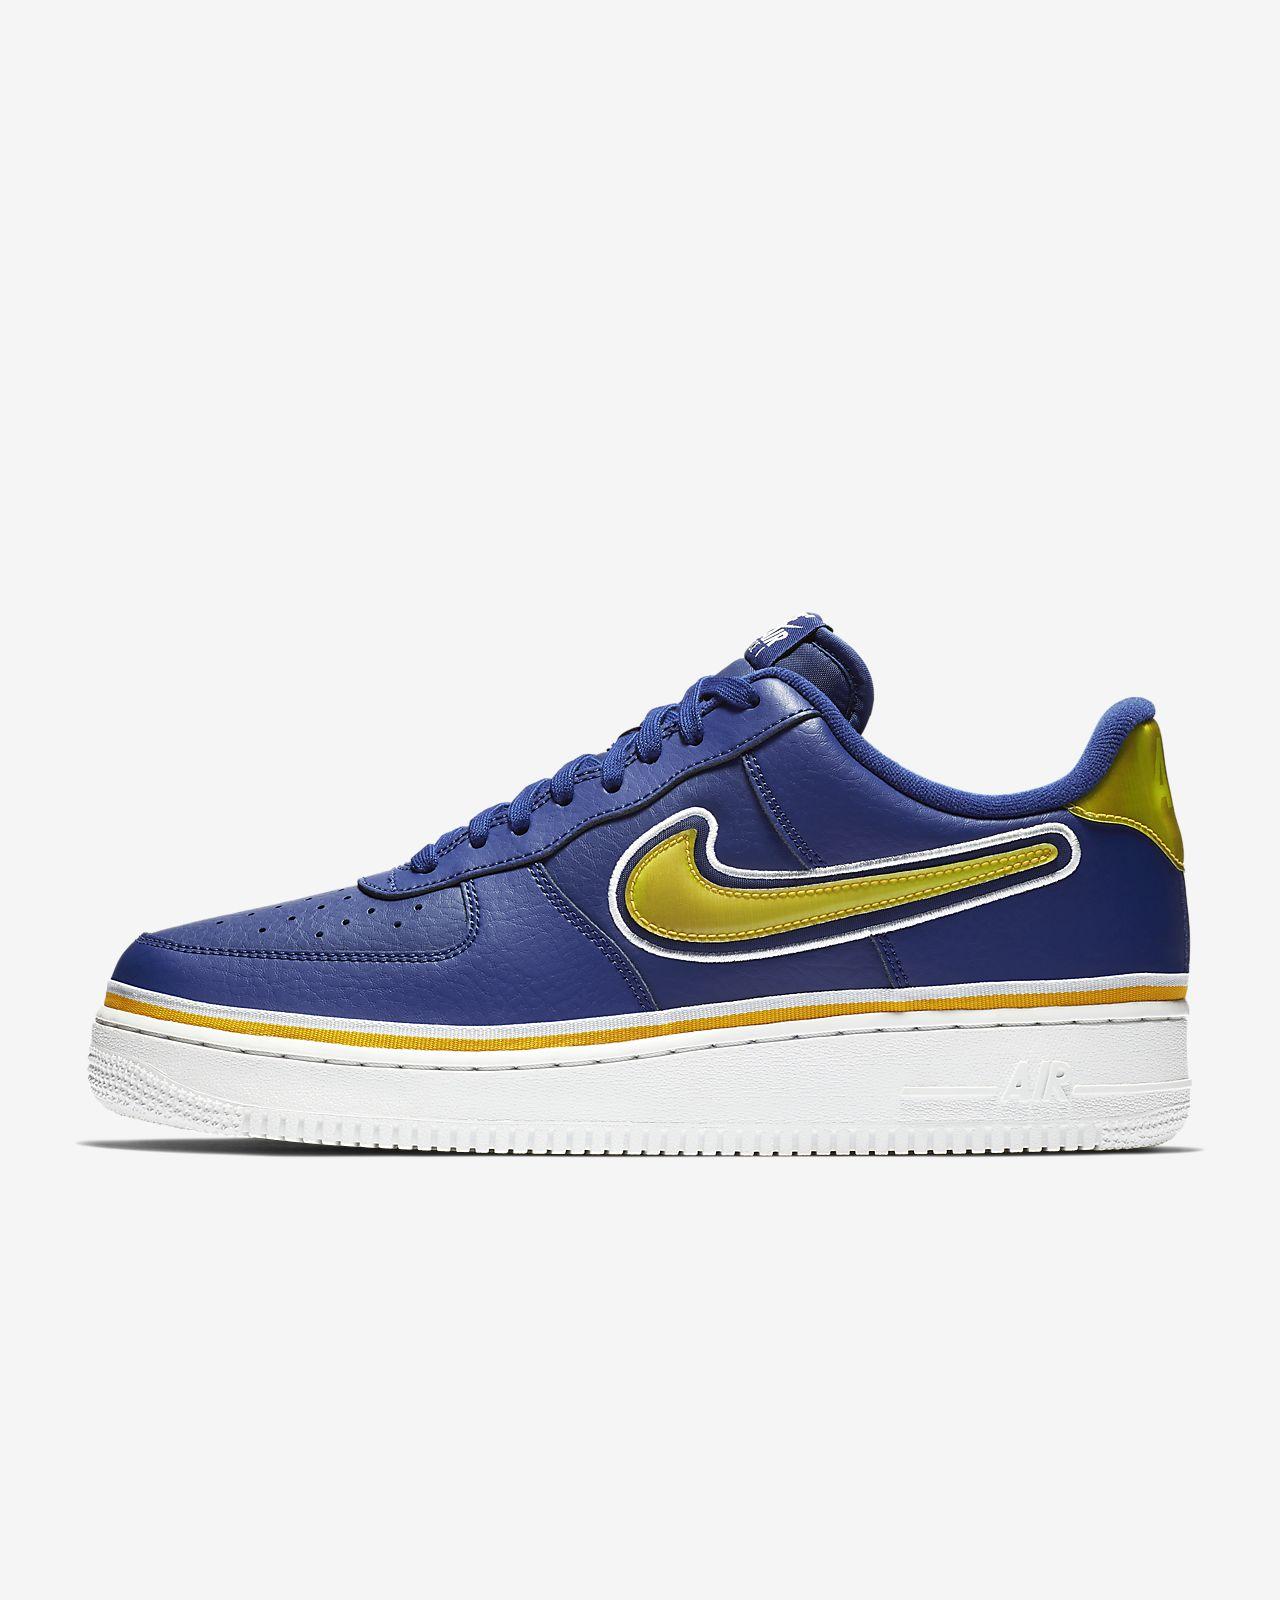 Nike Air Force 1 '07 LV8 Sport NBA-Schuh